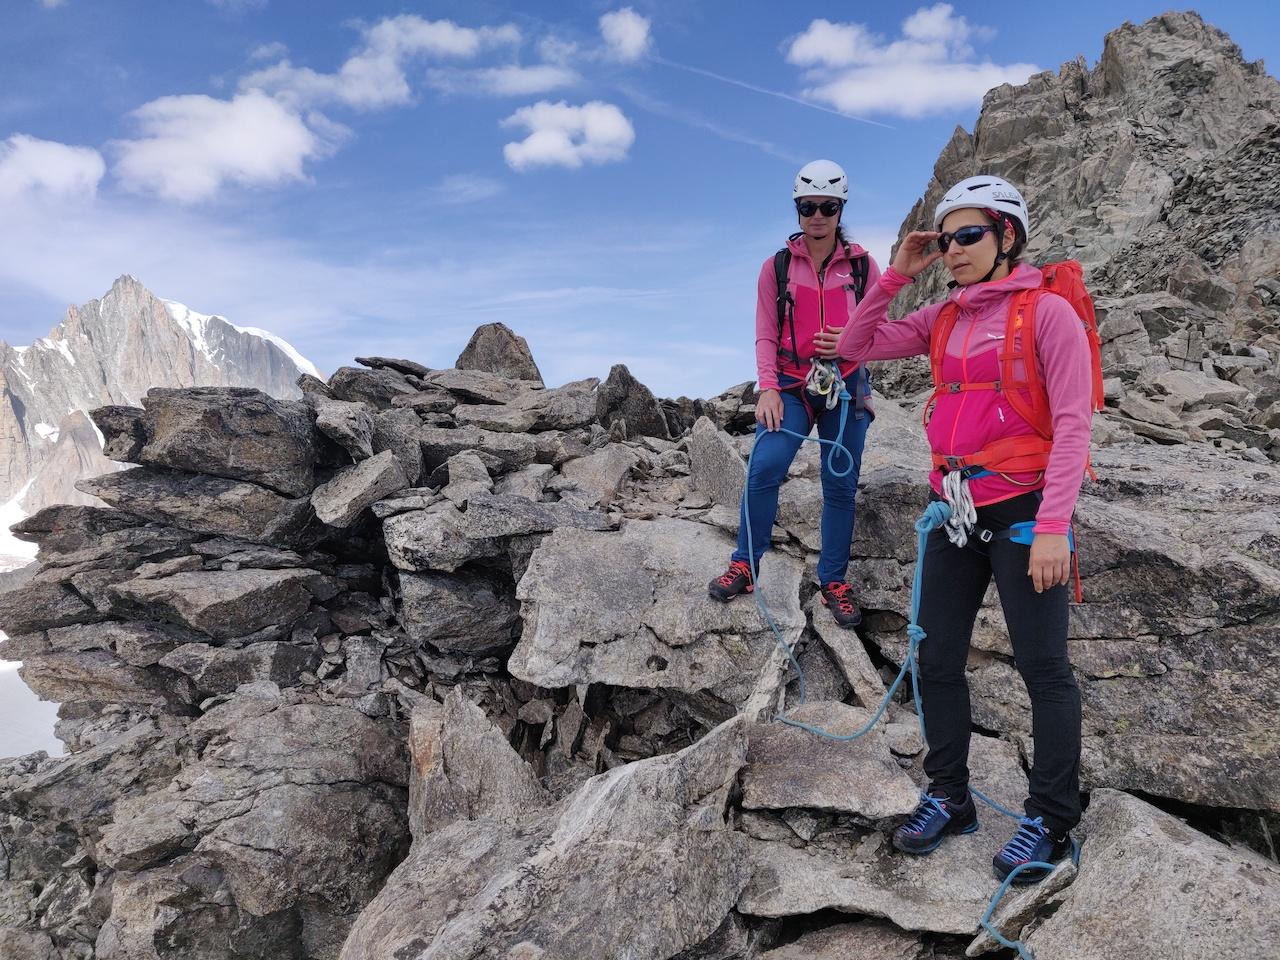 Imparando la roccia sulla cresta delle Aiguilles Marbrées